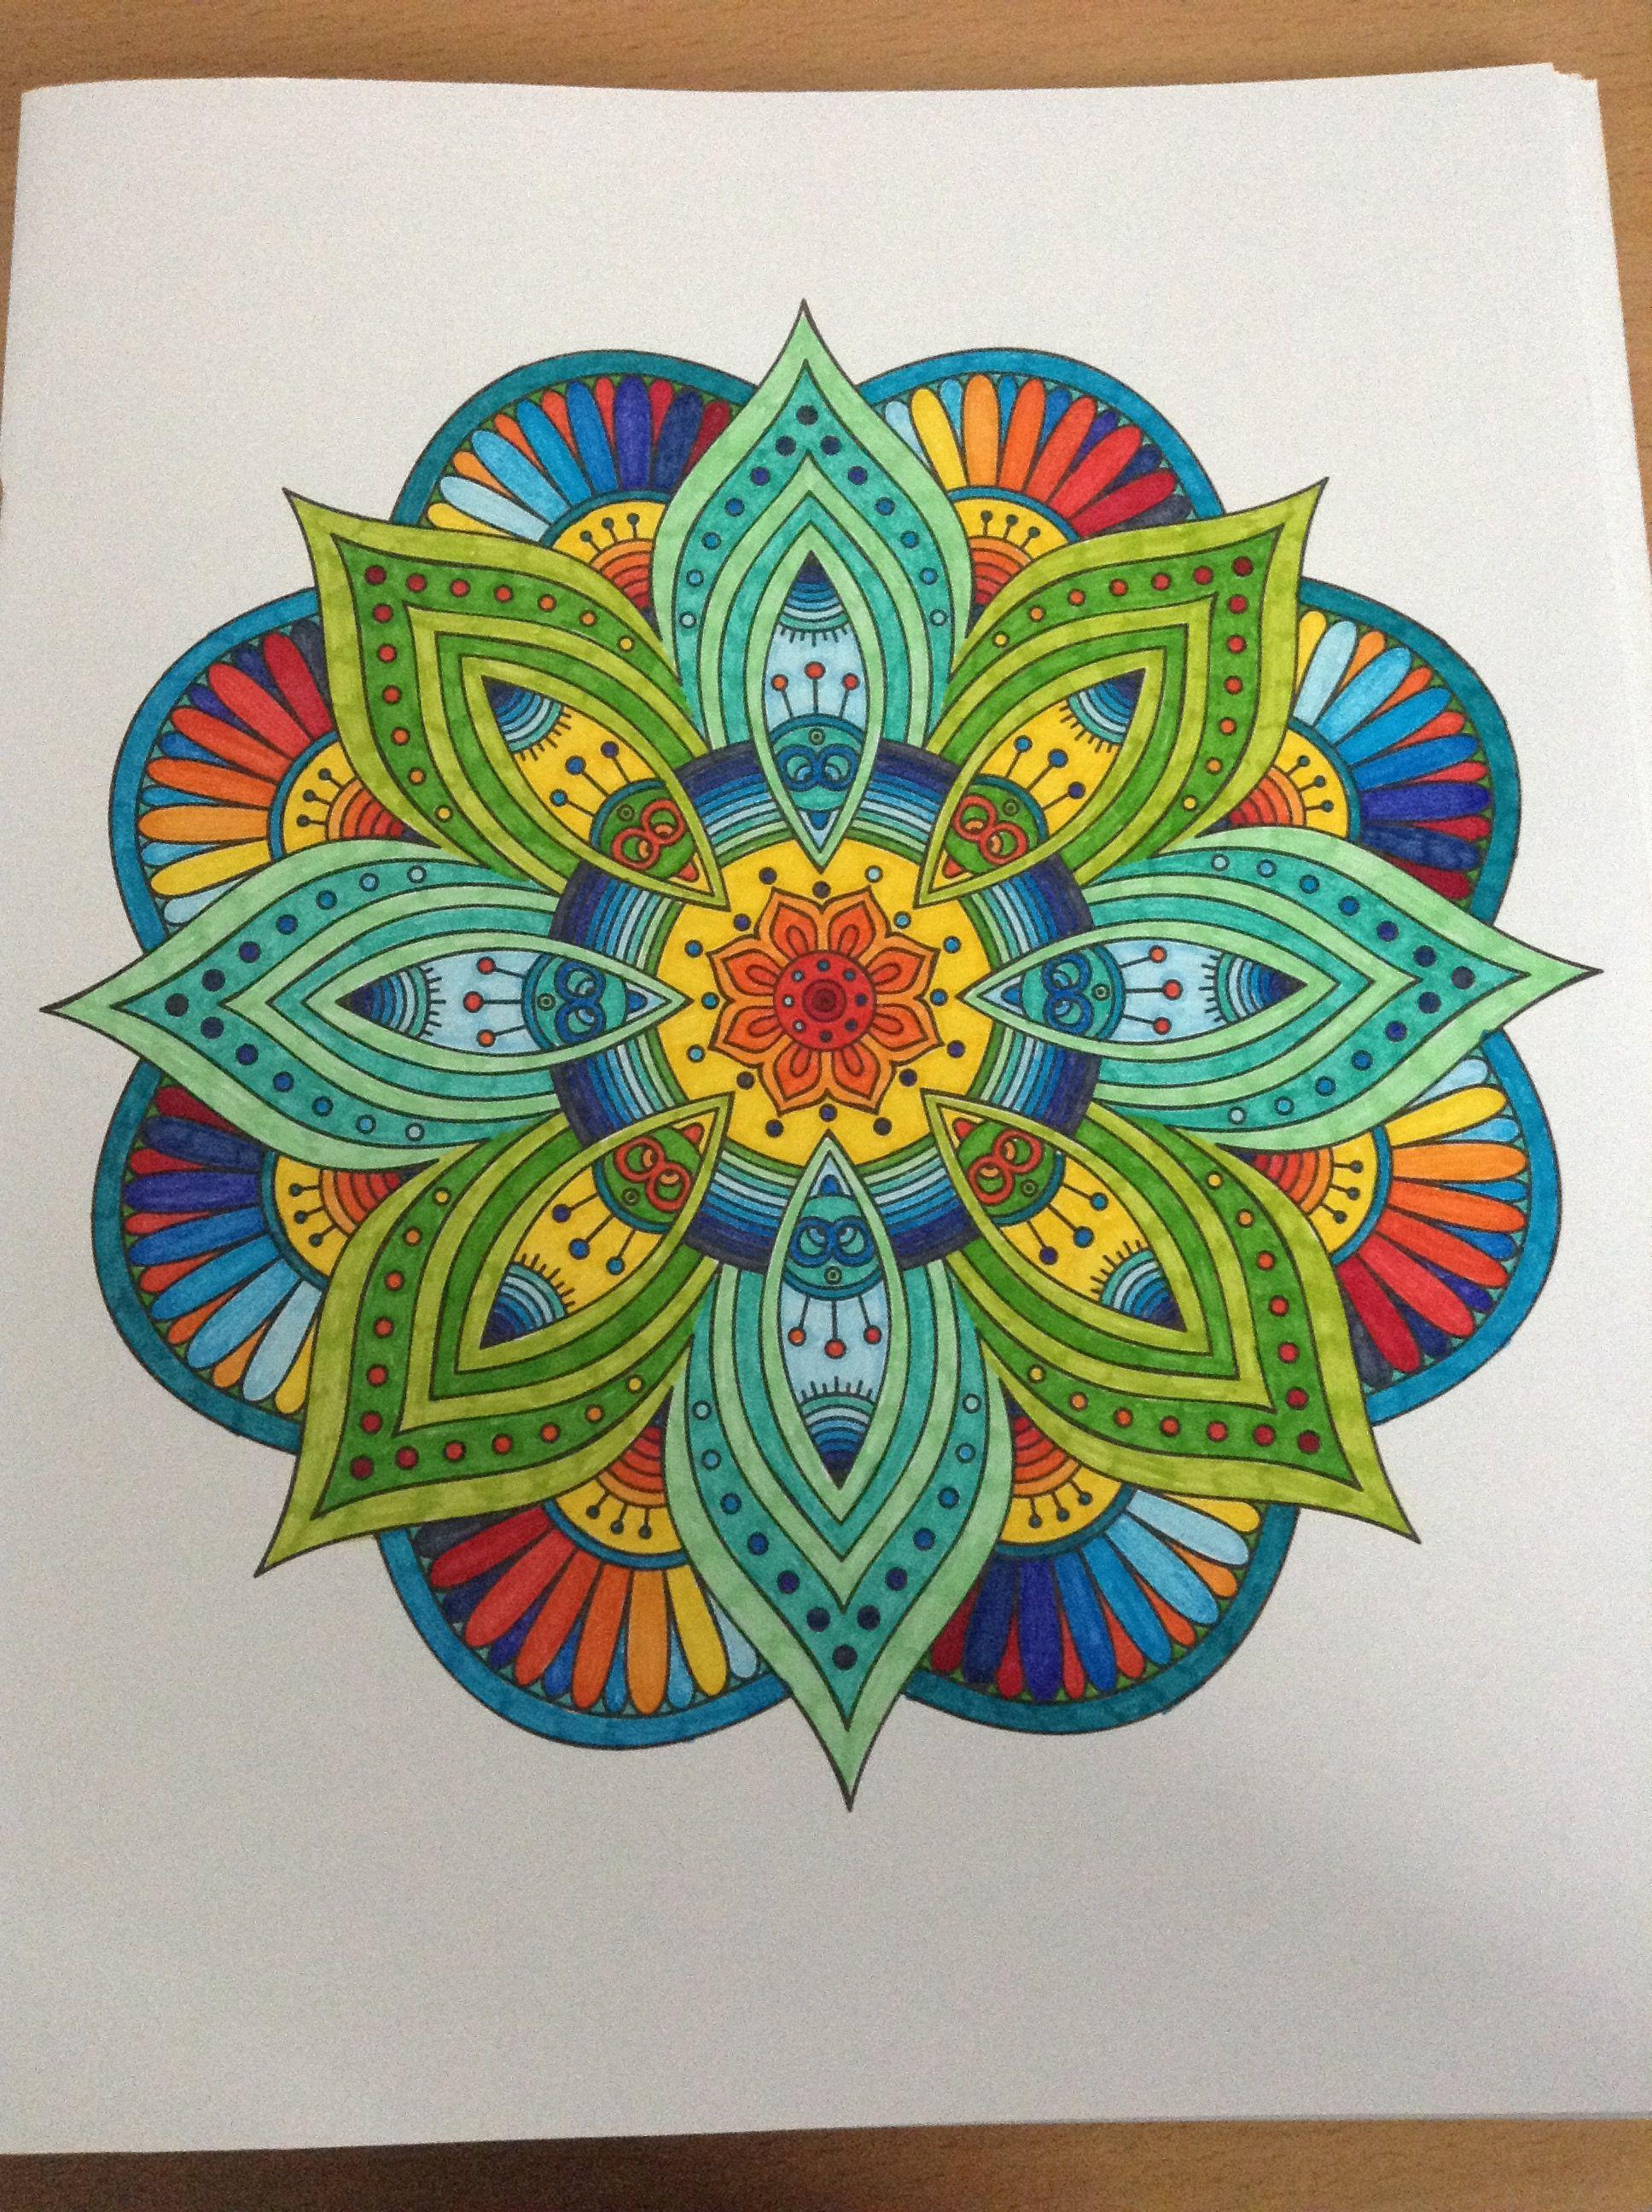 Pin de Karito Rivera en dibujos | Pinterest | Mandalas, Puntillismo ...